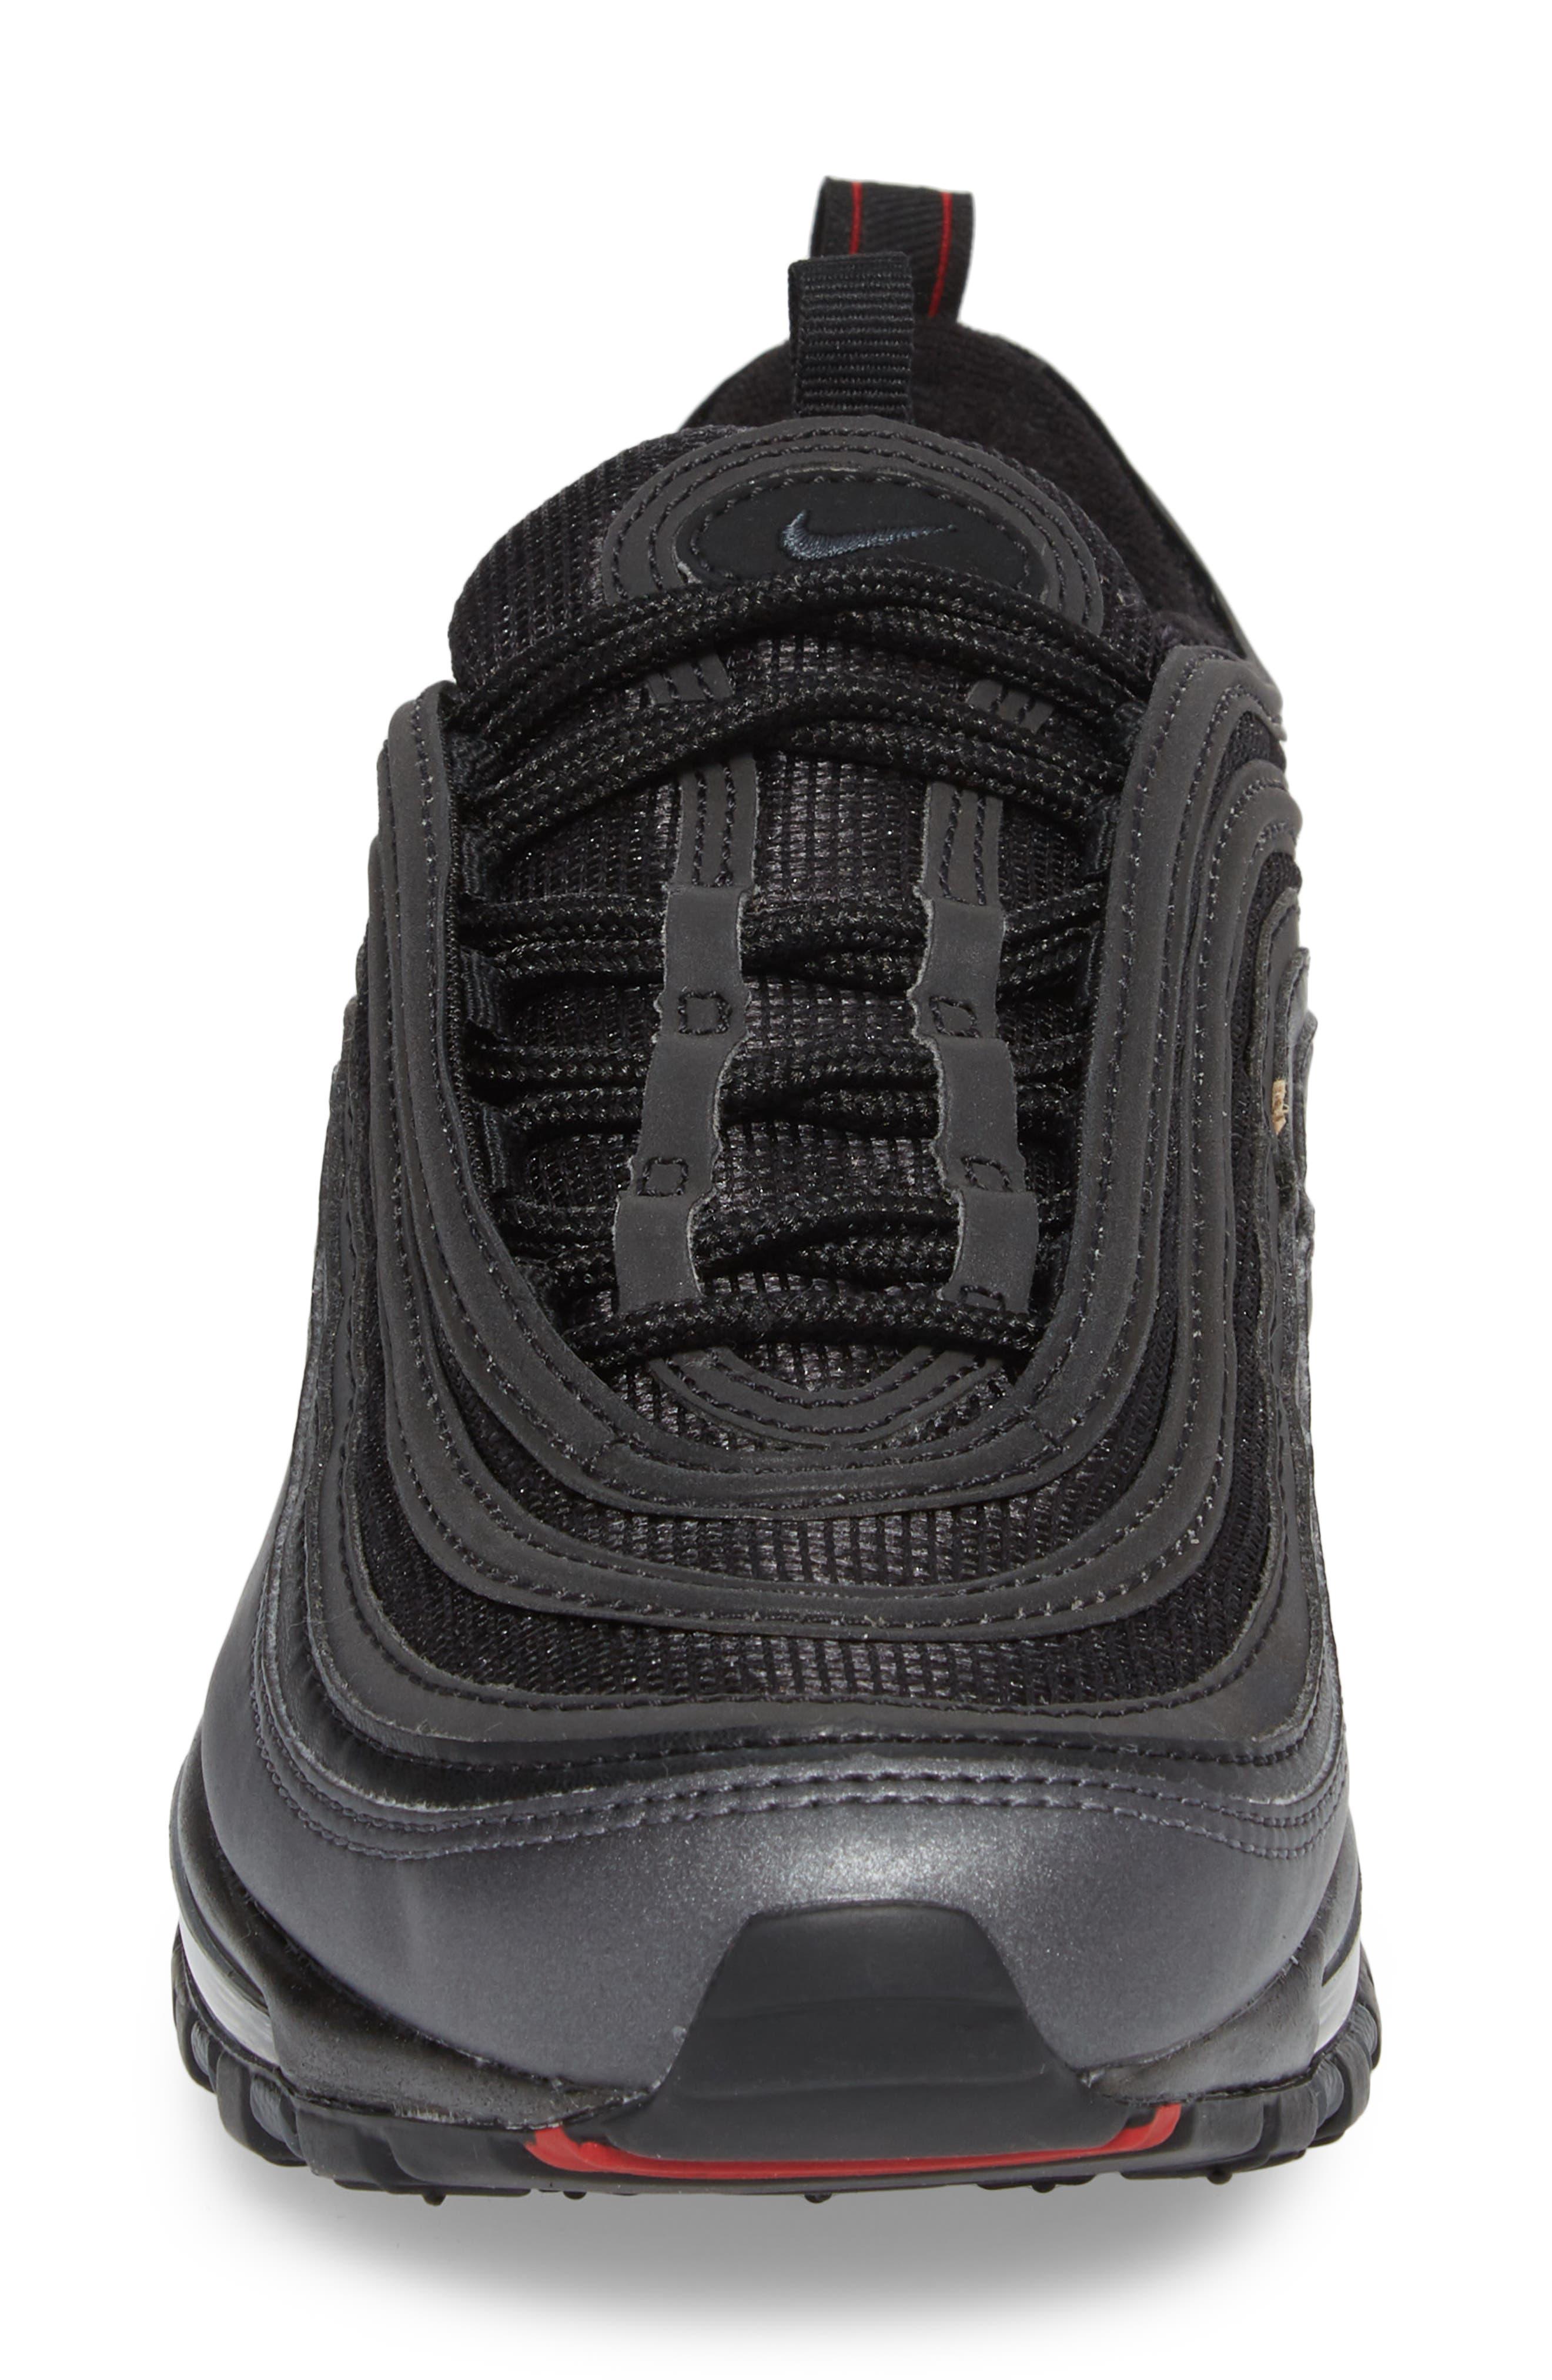 Air Max 97 Sneaker,                             Alternate thumbnail 4, color,                             Black/ Anthracite/ Hematite